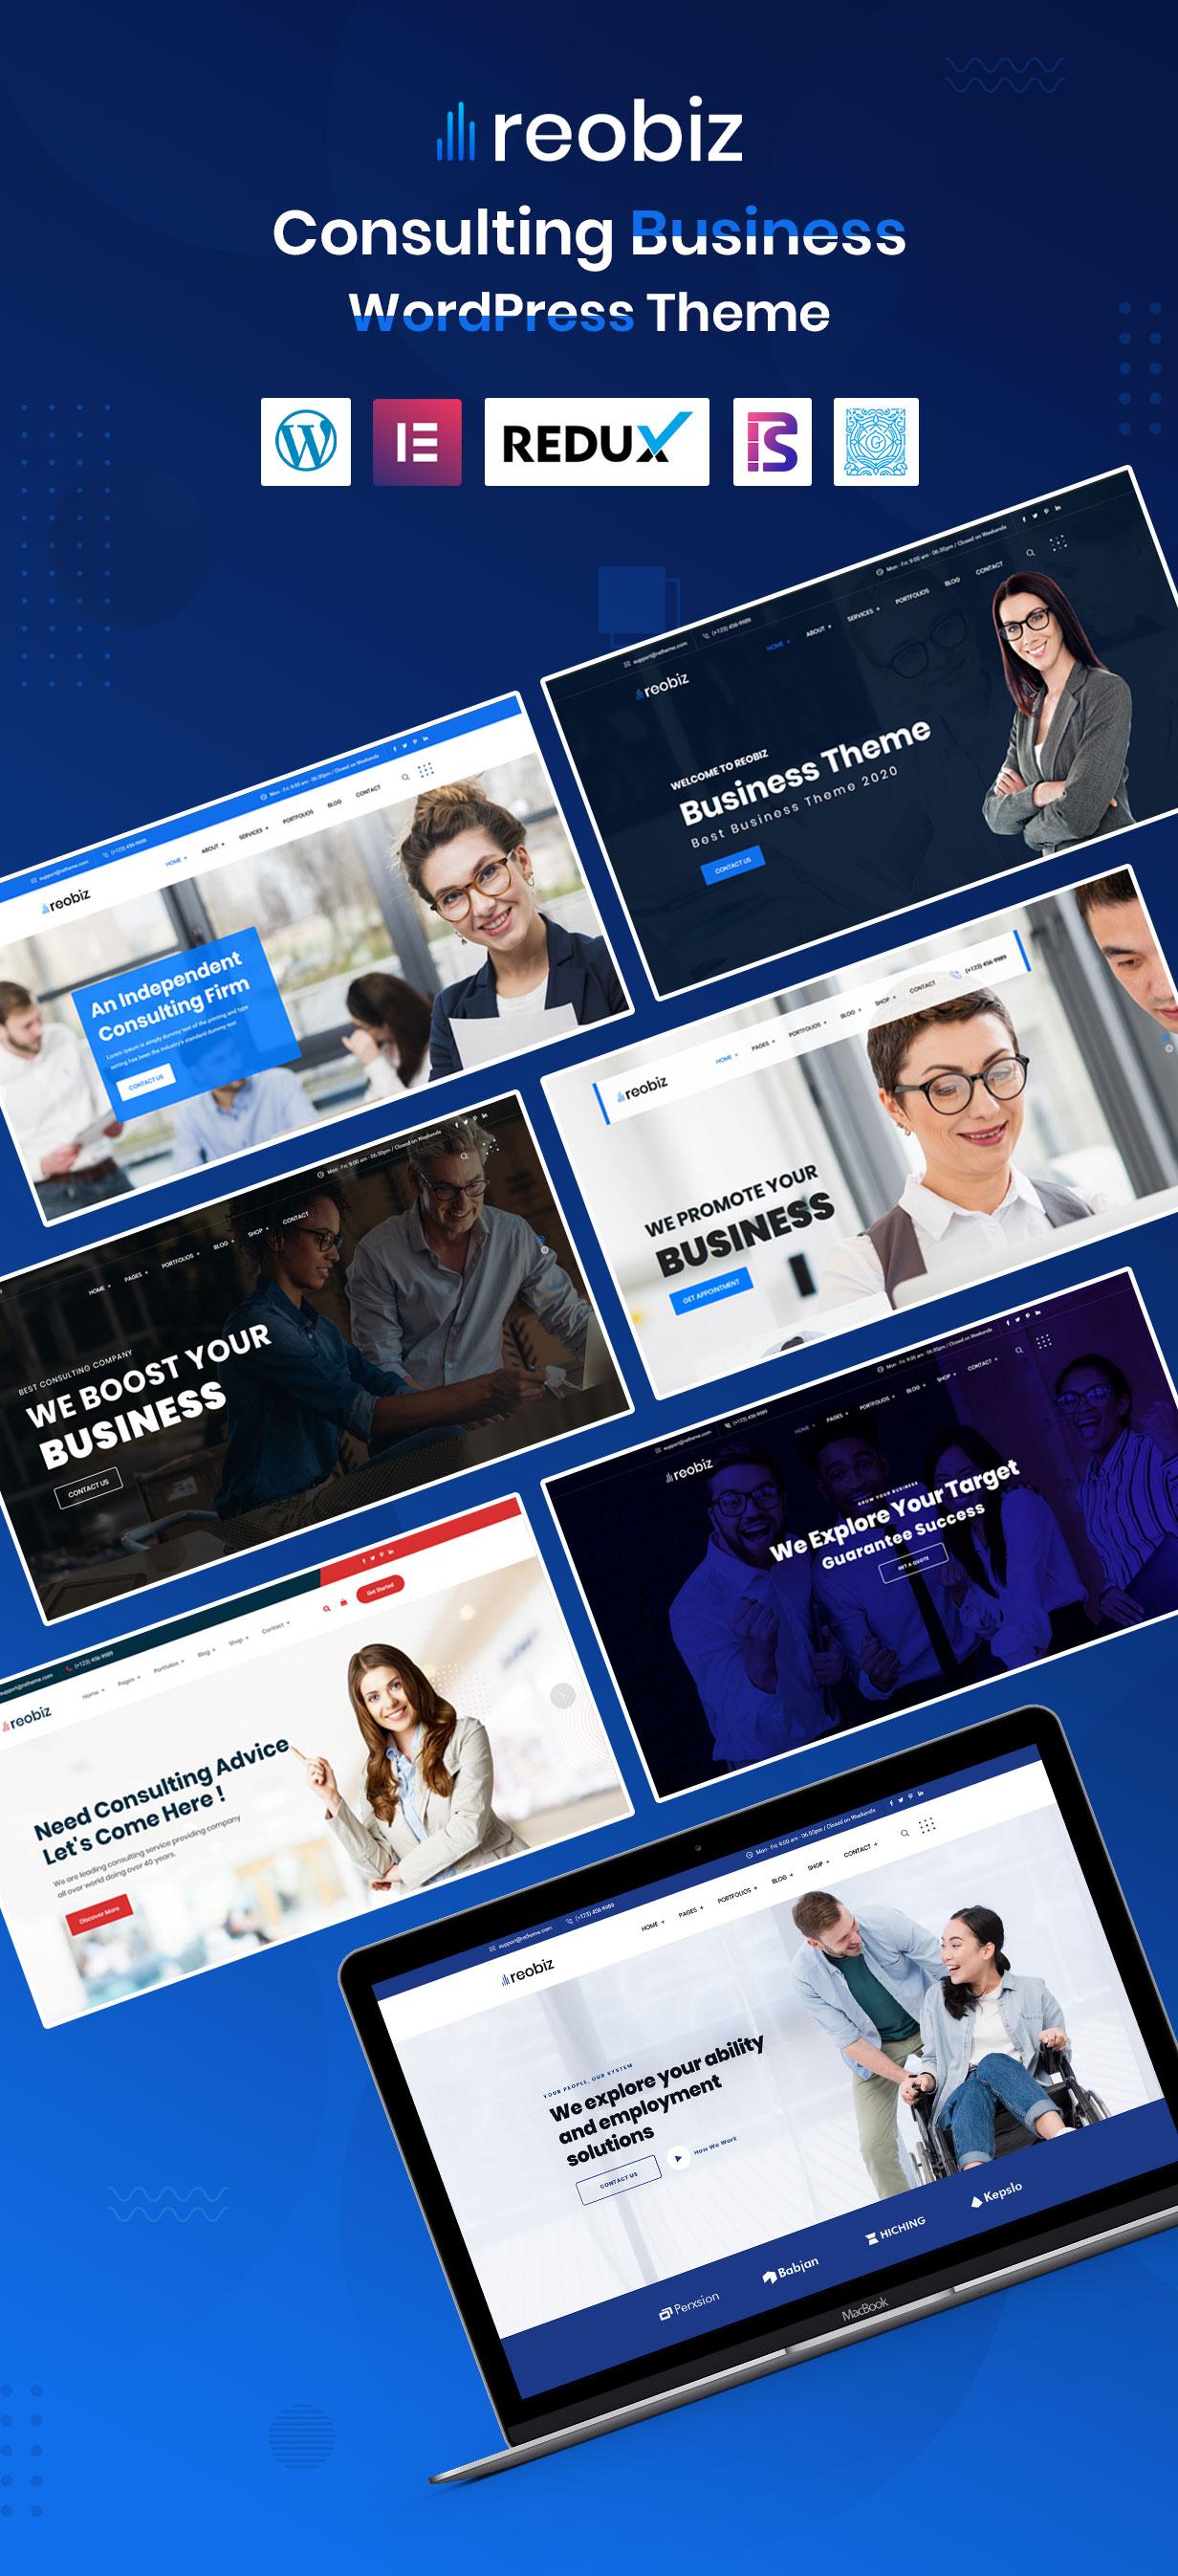 parts 134 - Reobiz - Consulting Business WordPress Theme